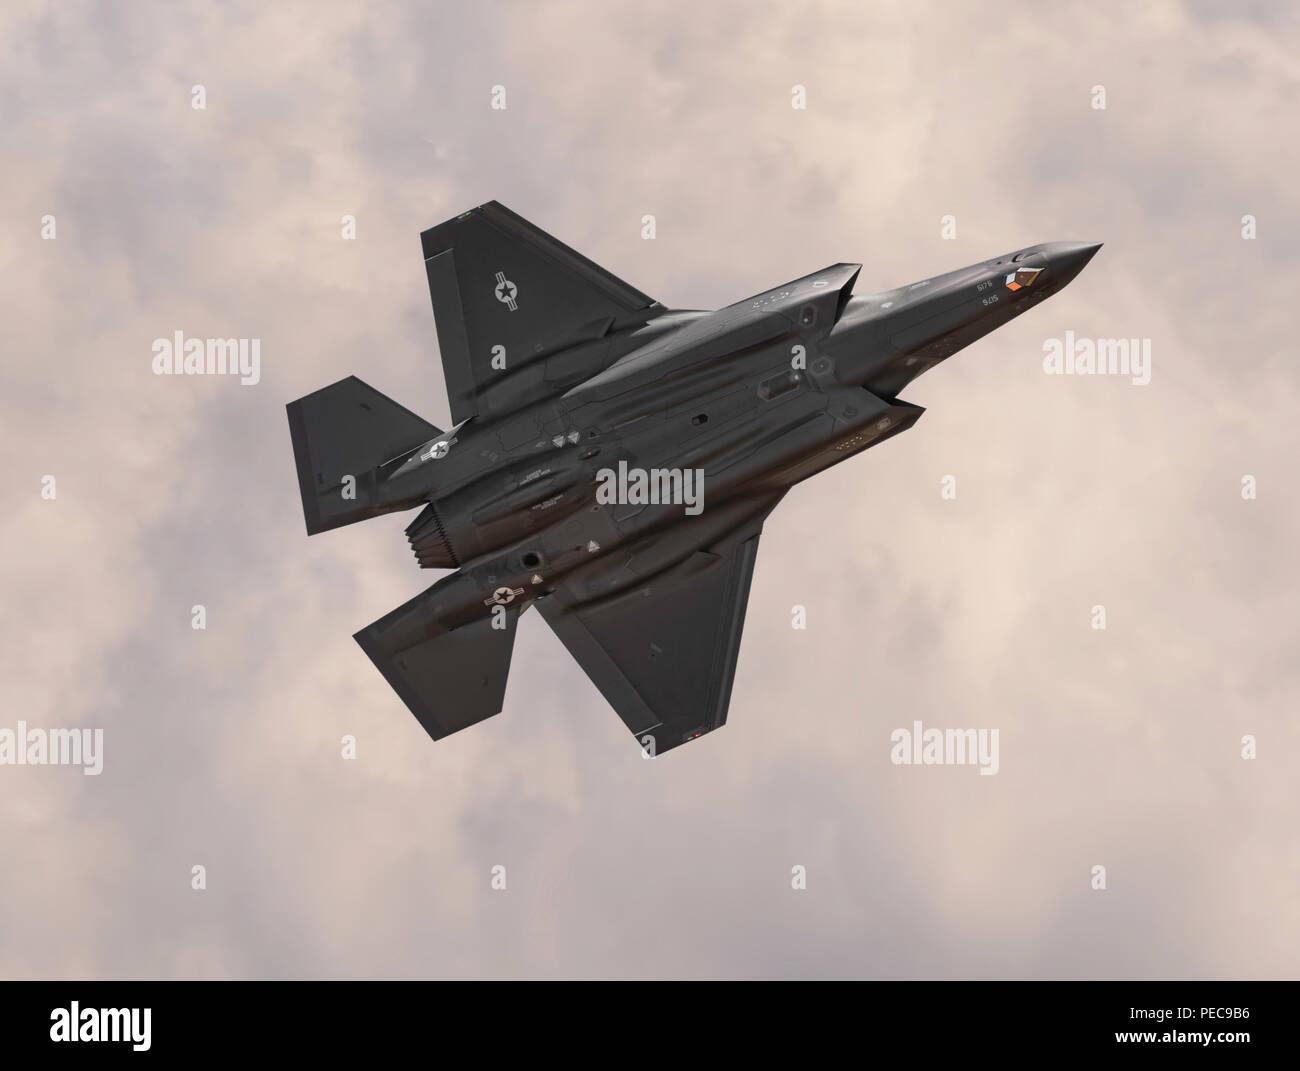 Lockheed F-35A Bottom View - Stock Image